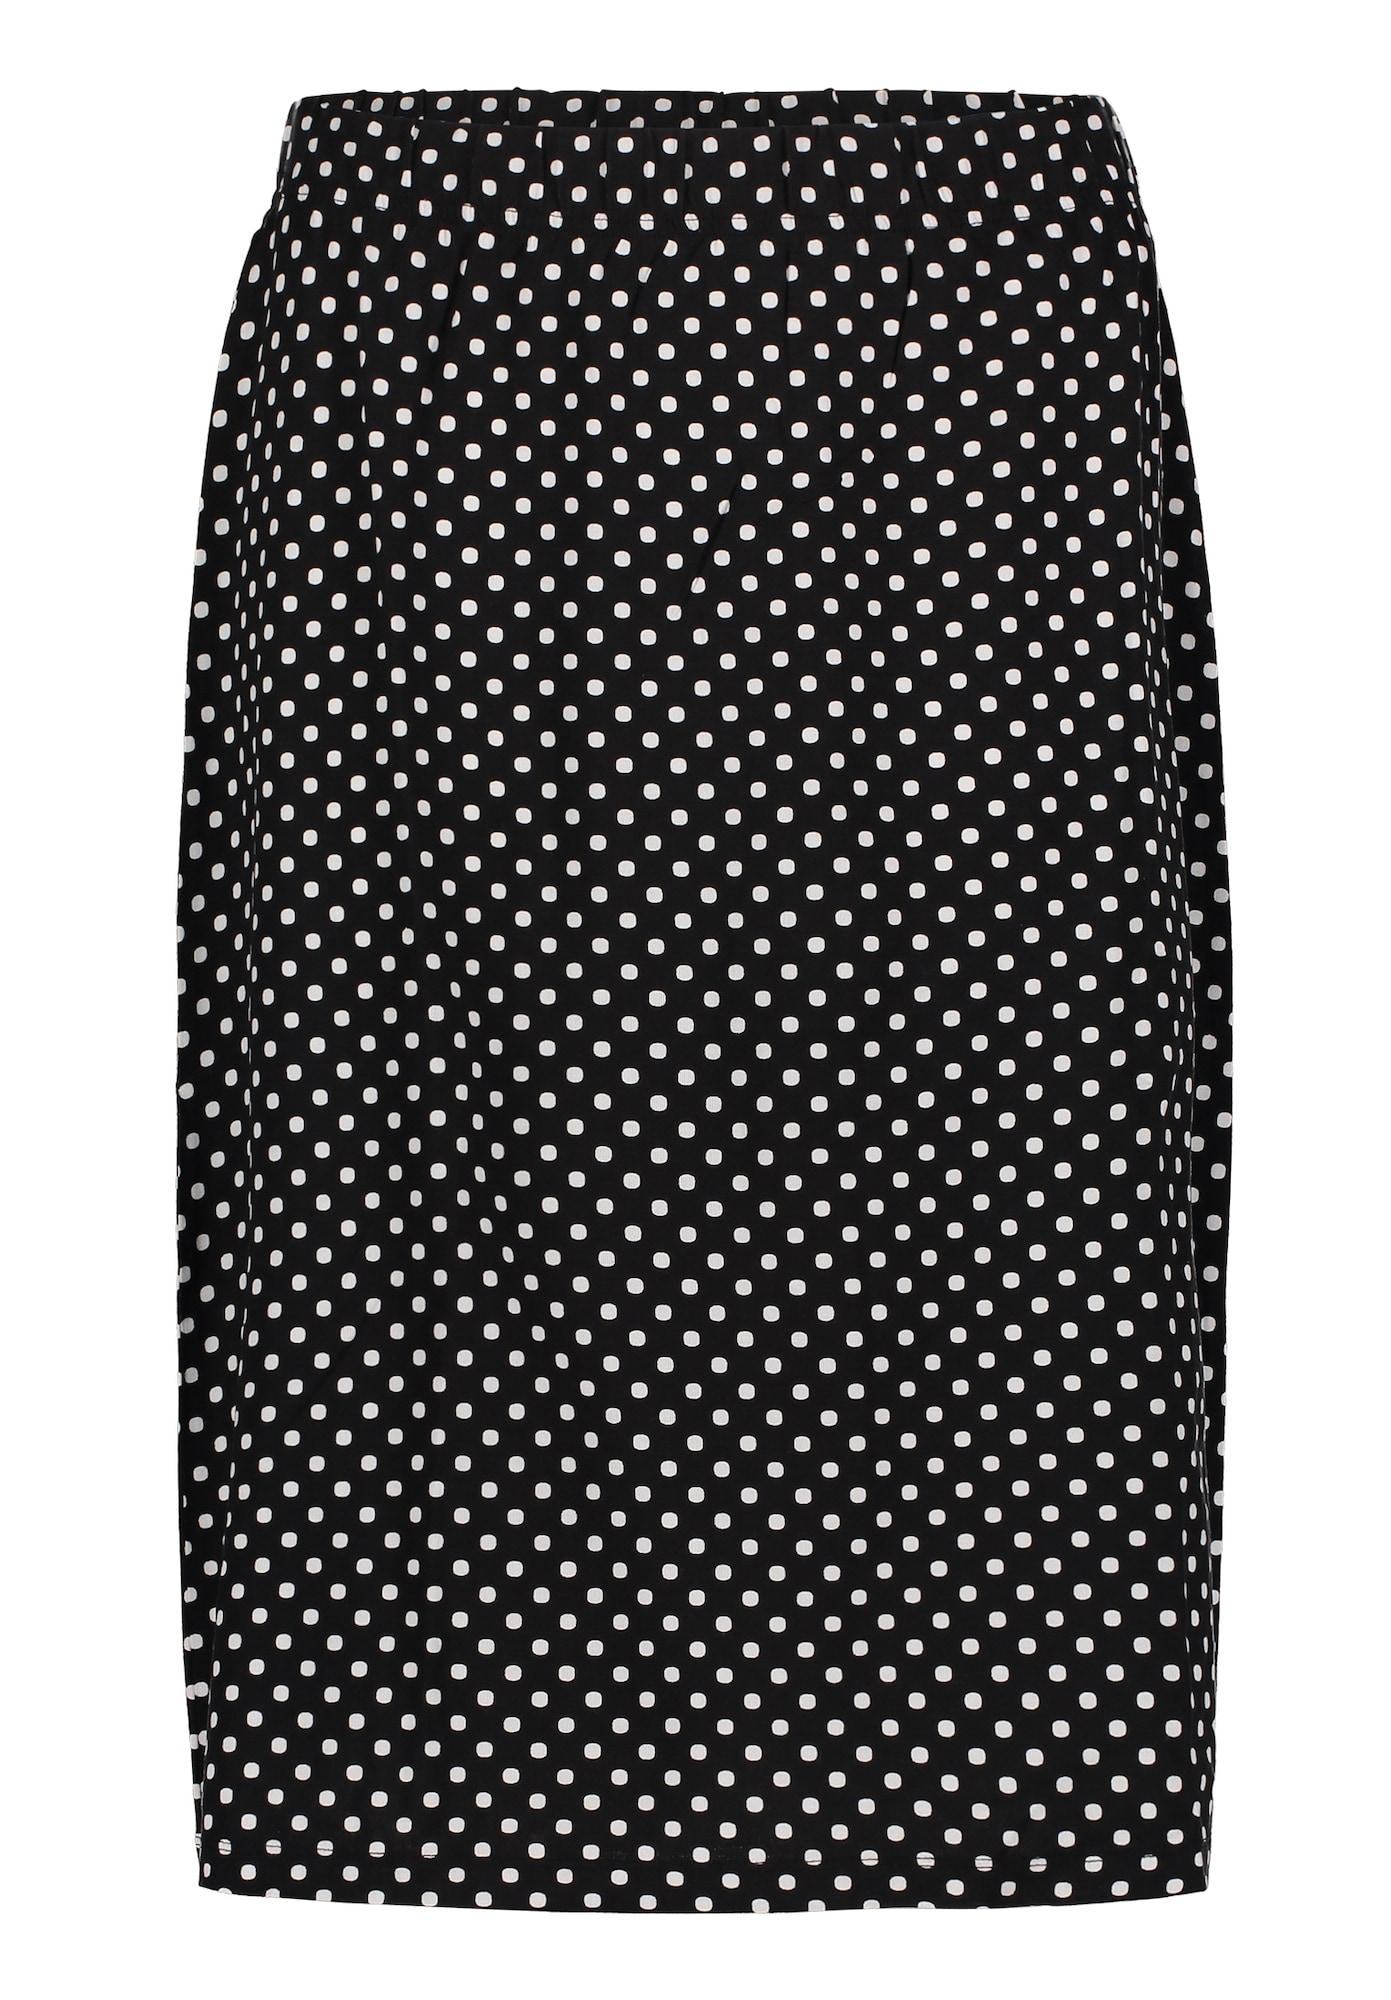 Jerseyrock   Bekleidung > Röcke > Jerseyröcke   Schwarz - Weiß   Betty Barclay